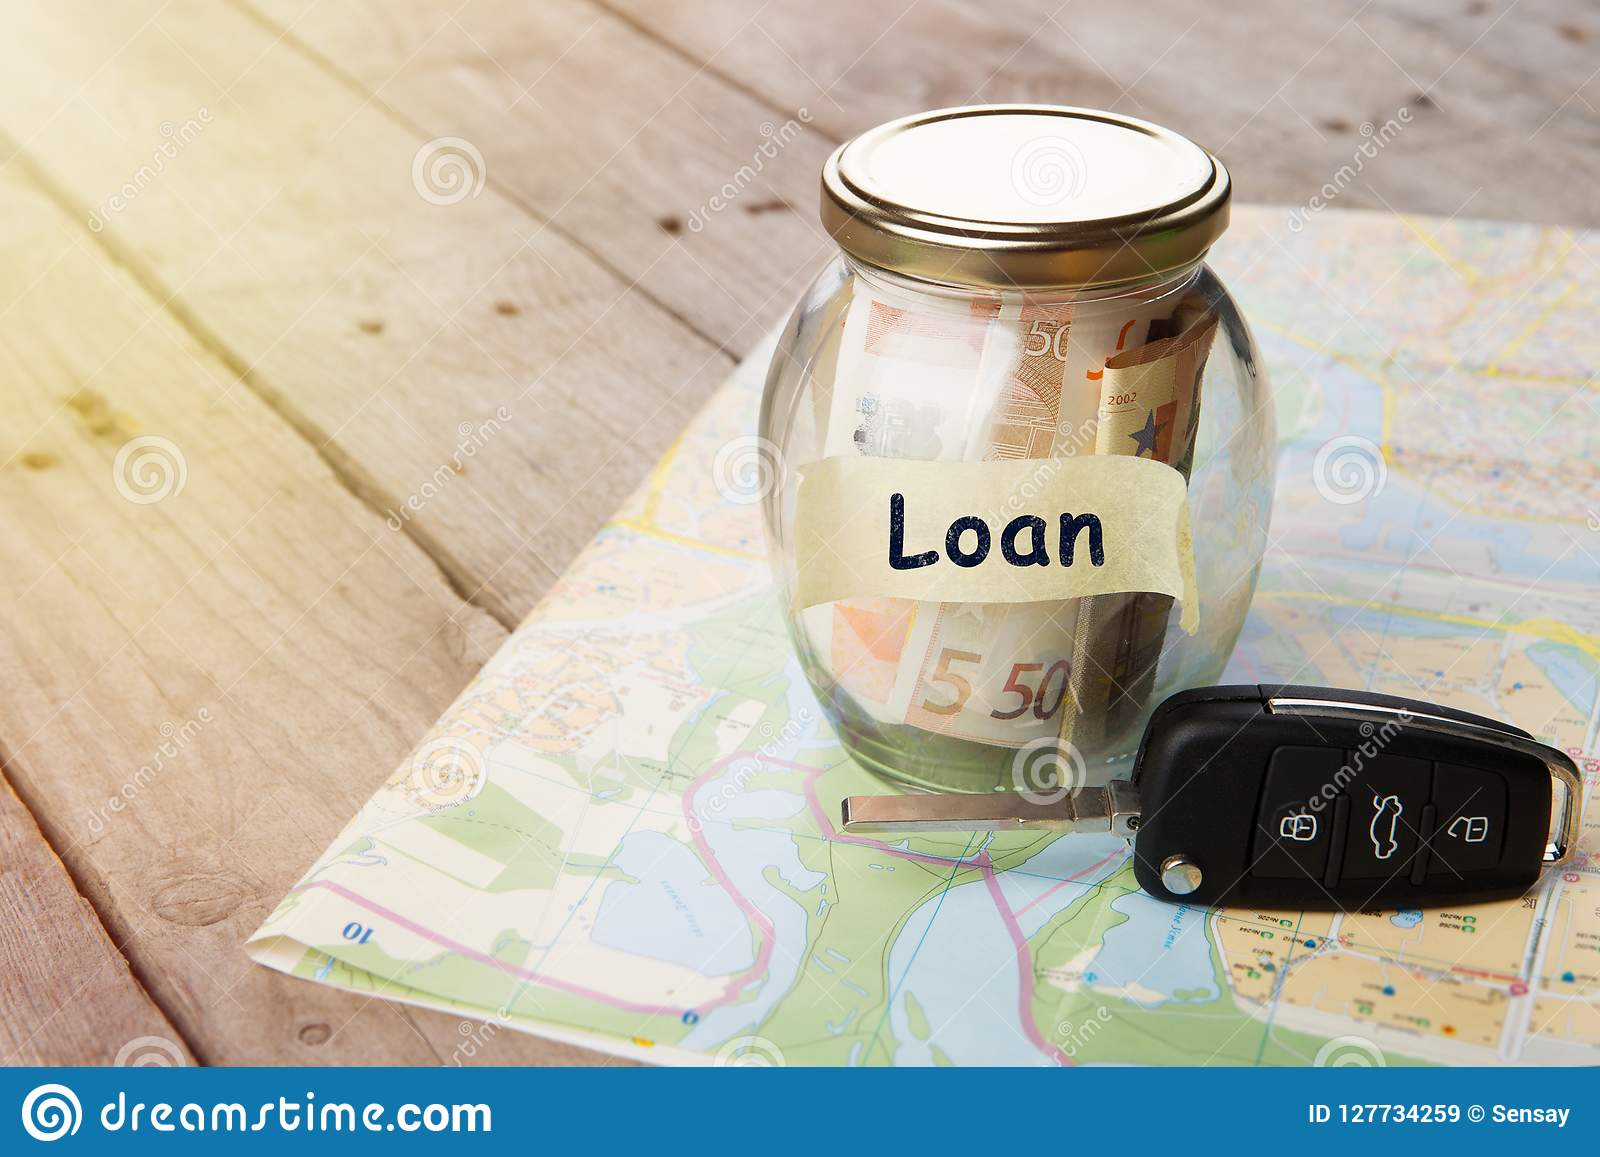 Car finance concept - money glass with word Loan, car key